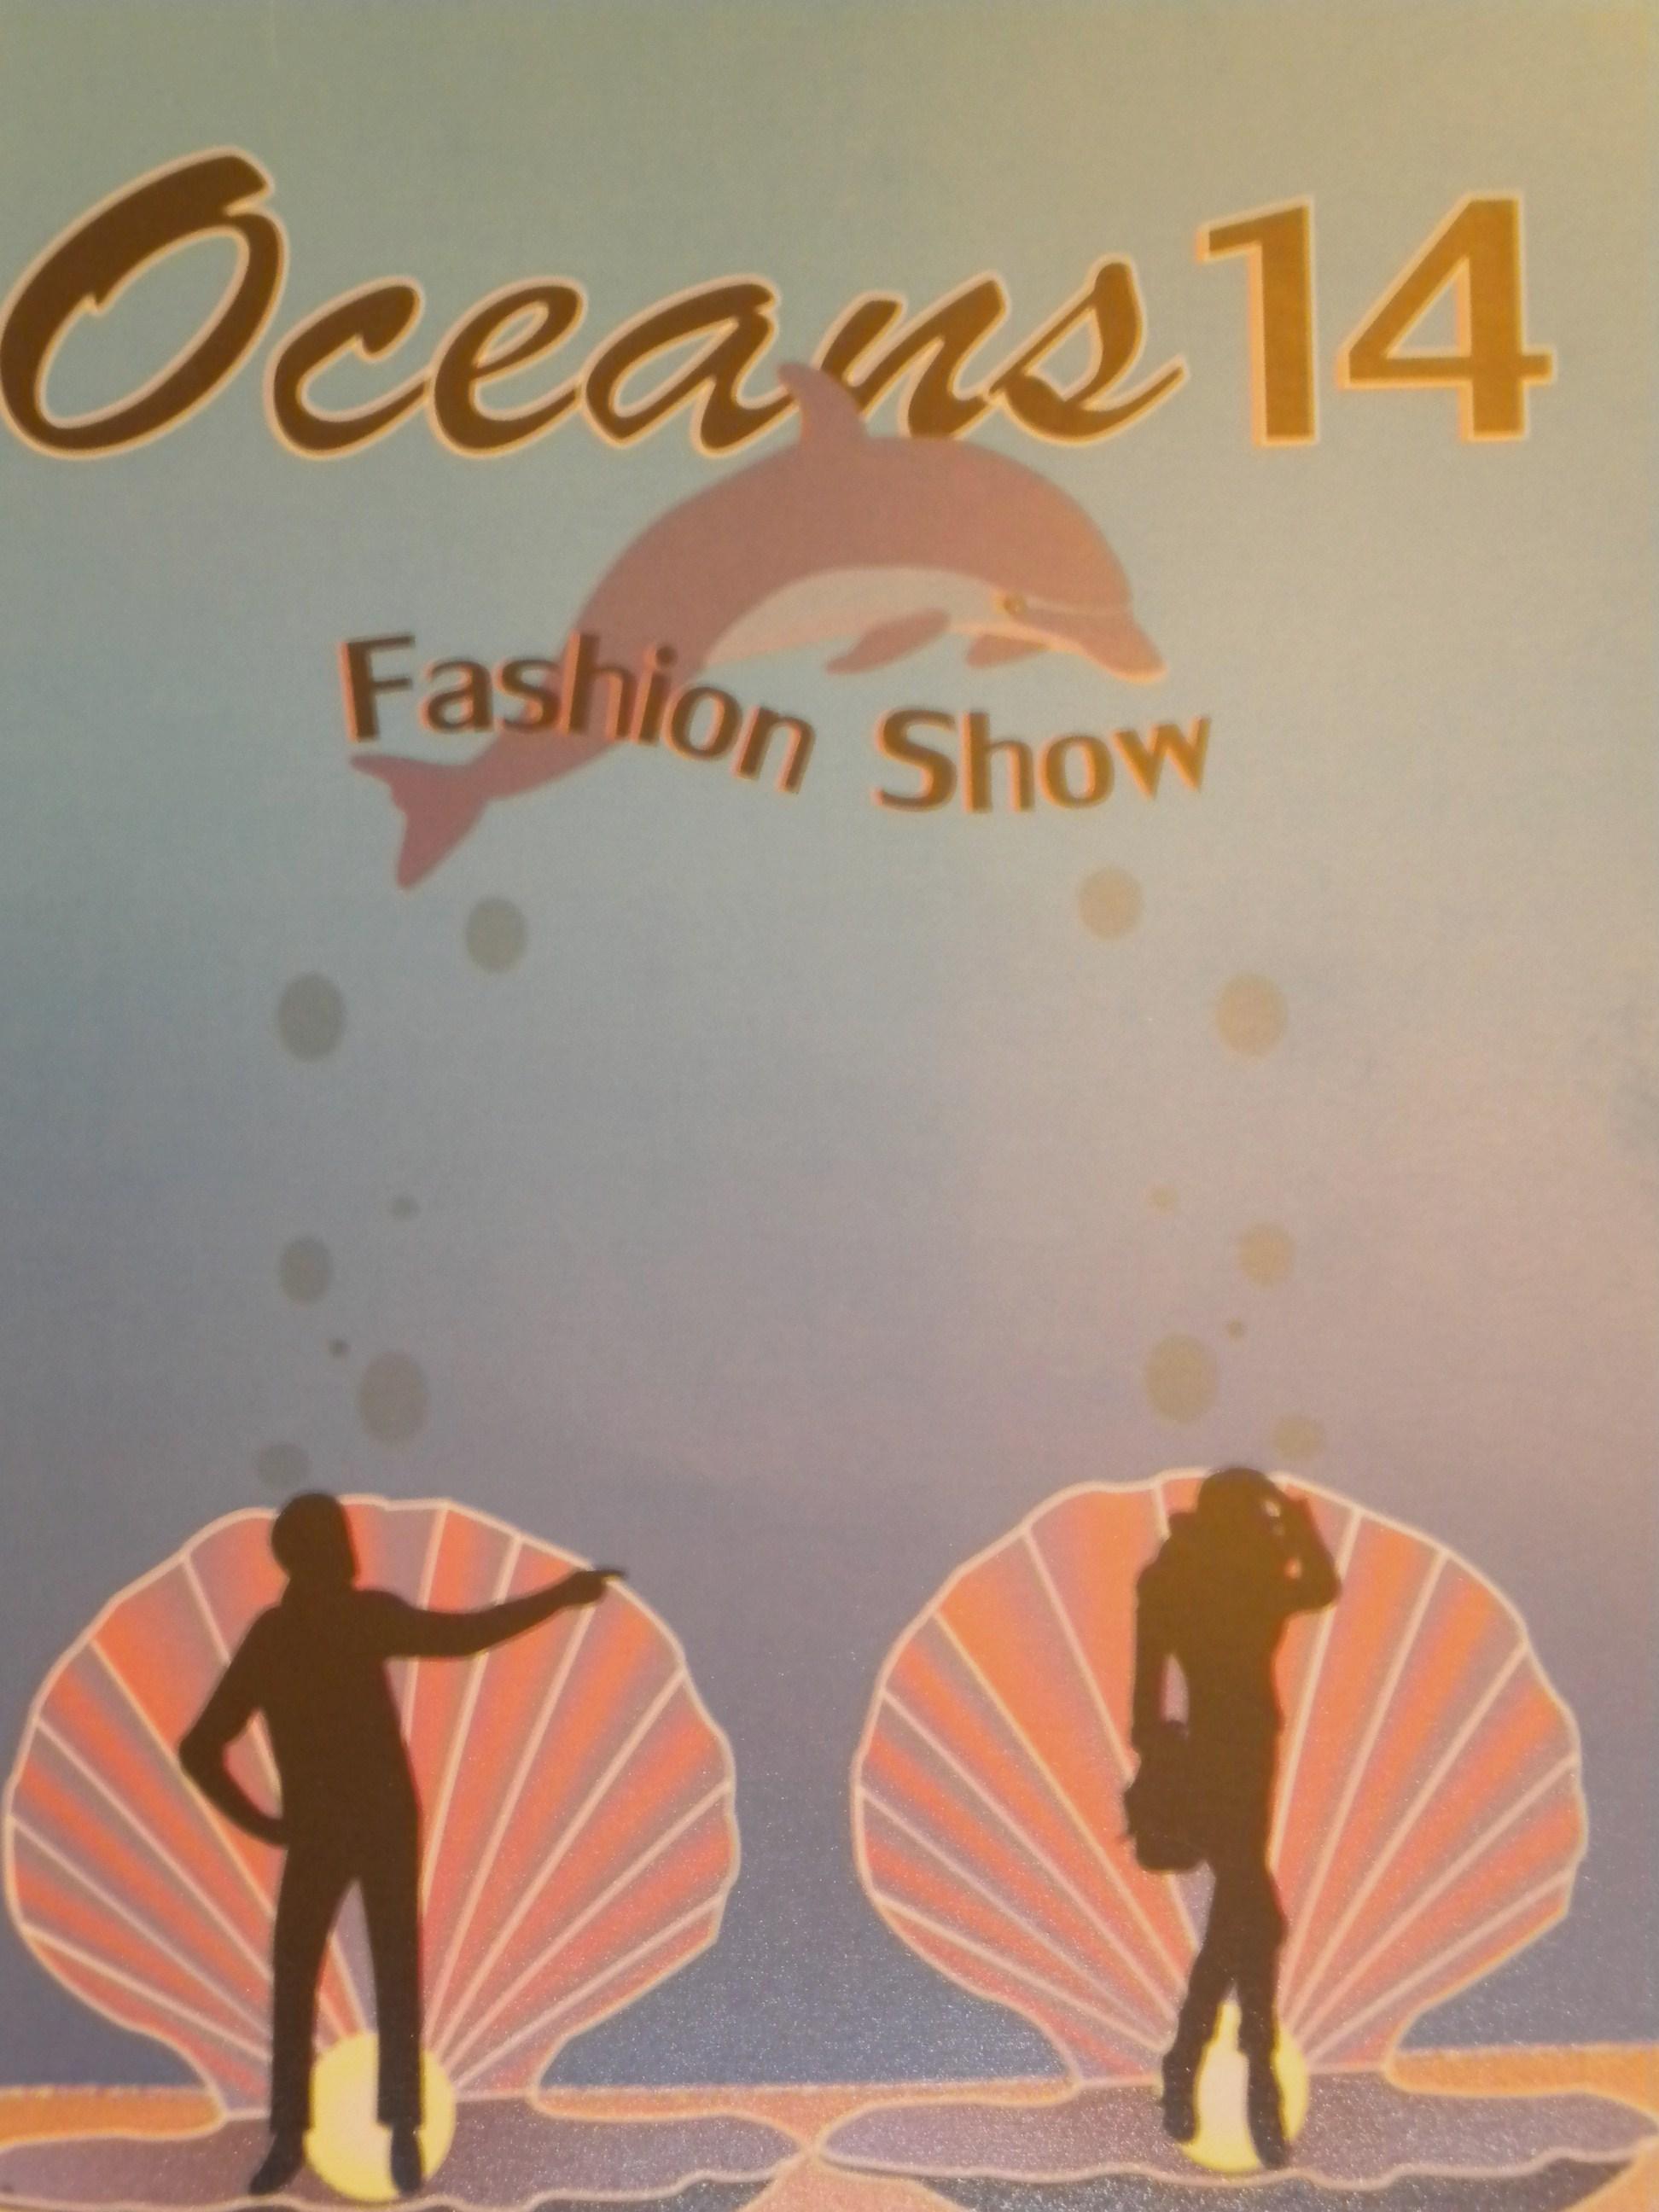 2f63df2929abee3d251a_Oceans14.JPG